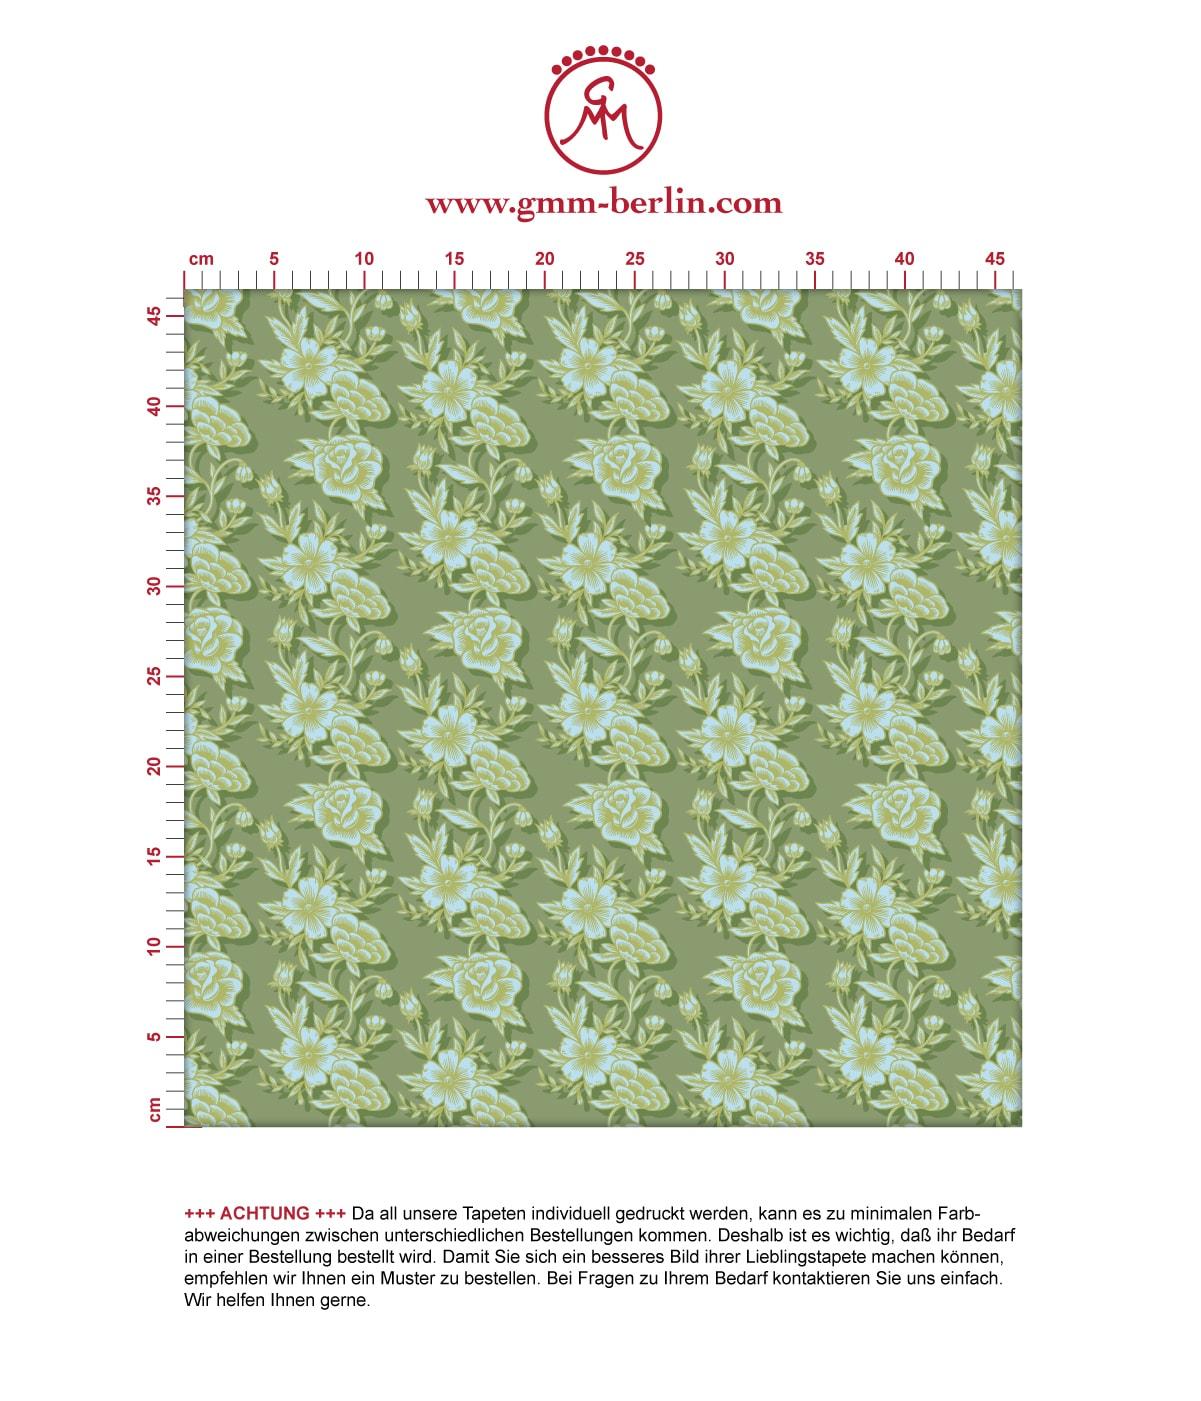 Grüne Blümchen Tapete